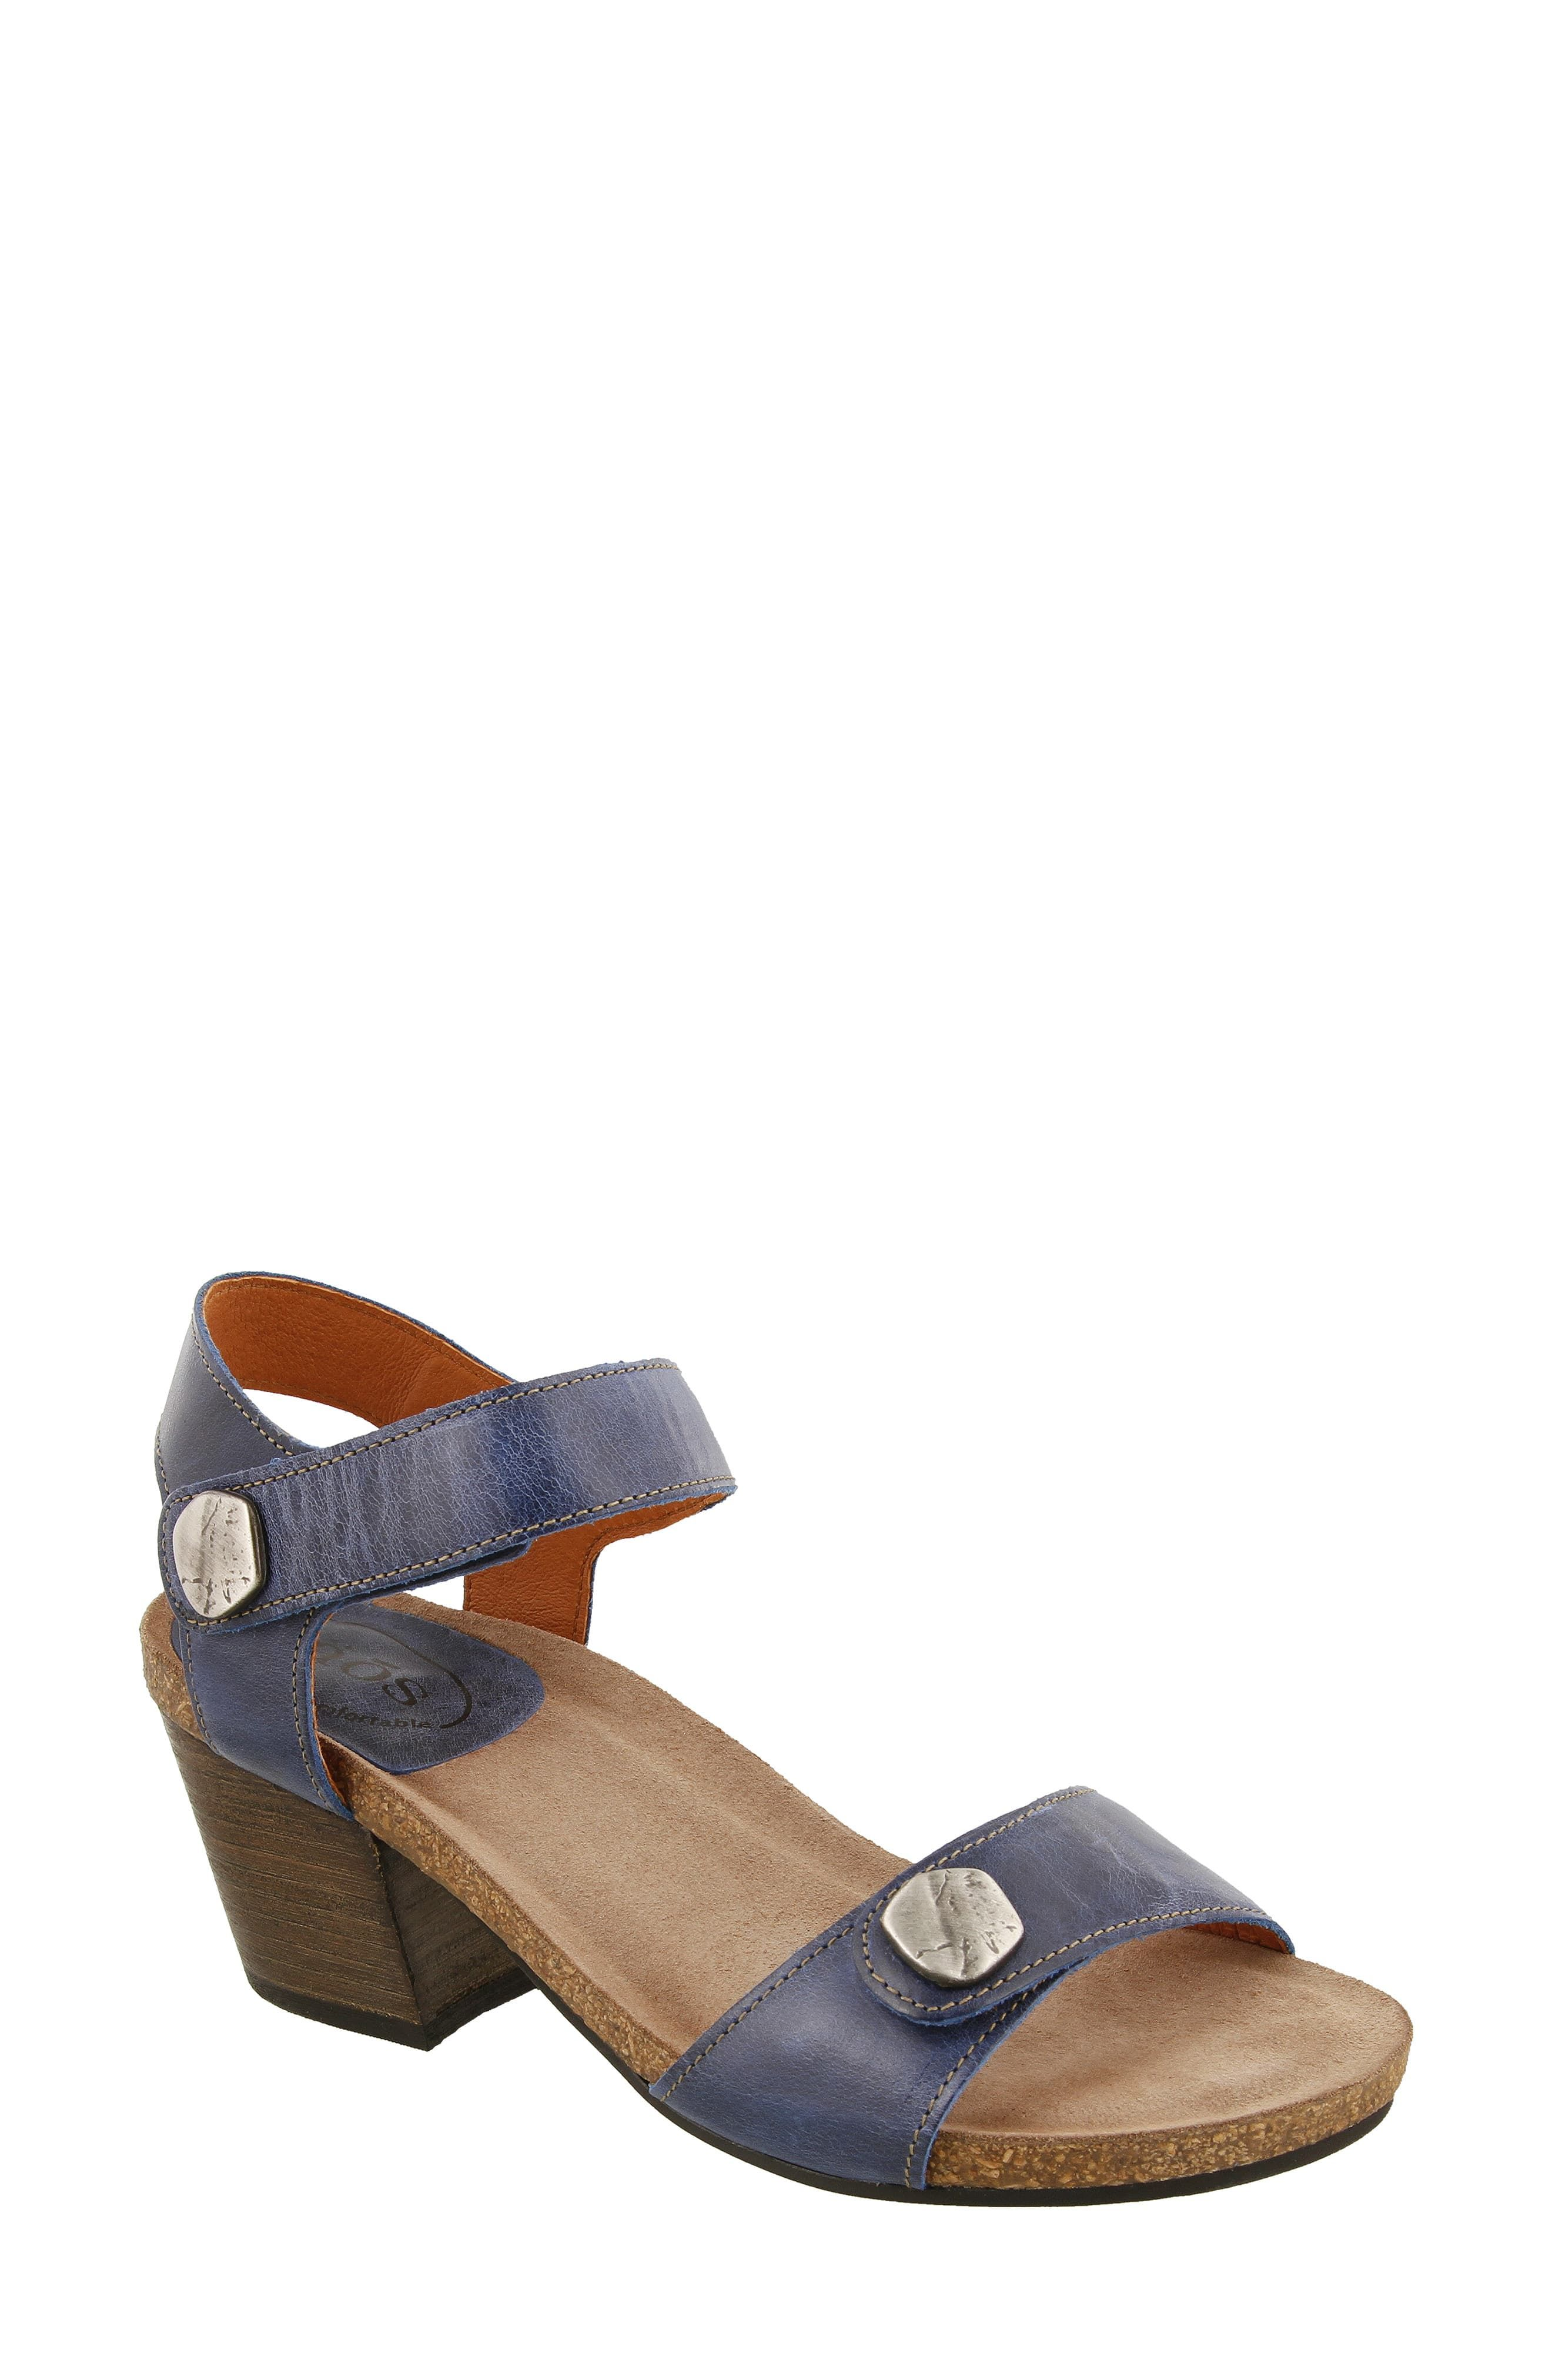 Taos Footwear Sandals heel comfort leather adjustable Taos Shoes Envy